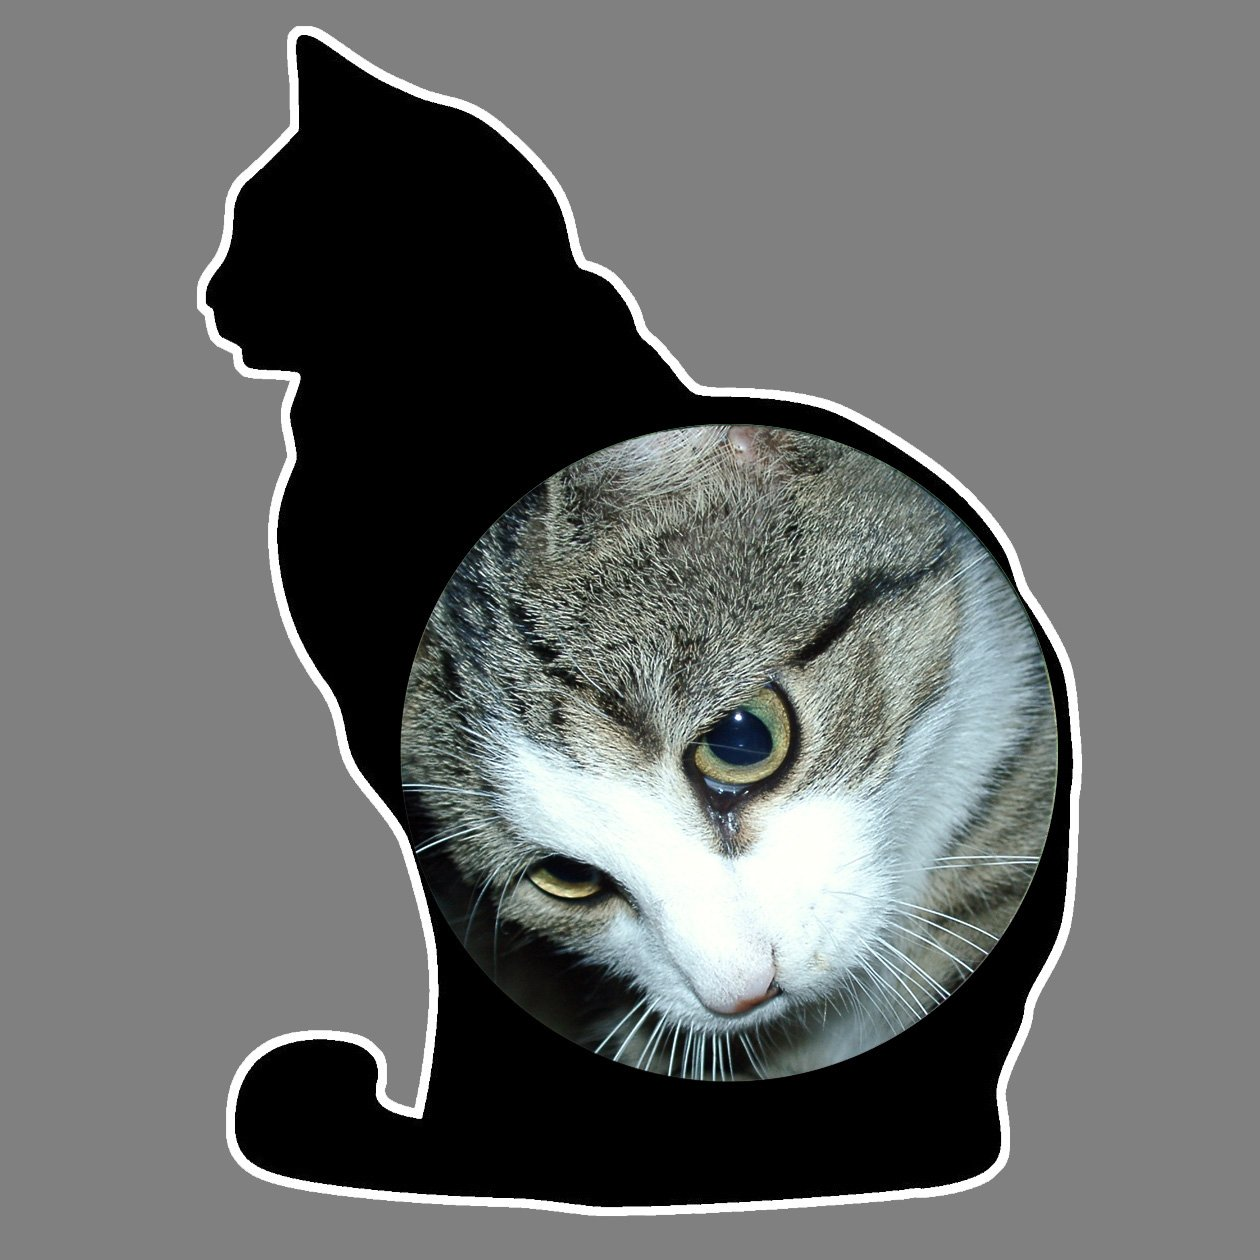 Parking Permit Holder Skin Black Cat Kitten Silhouette Free UK Postage